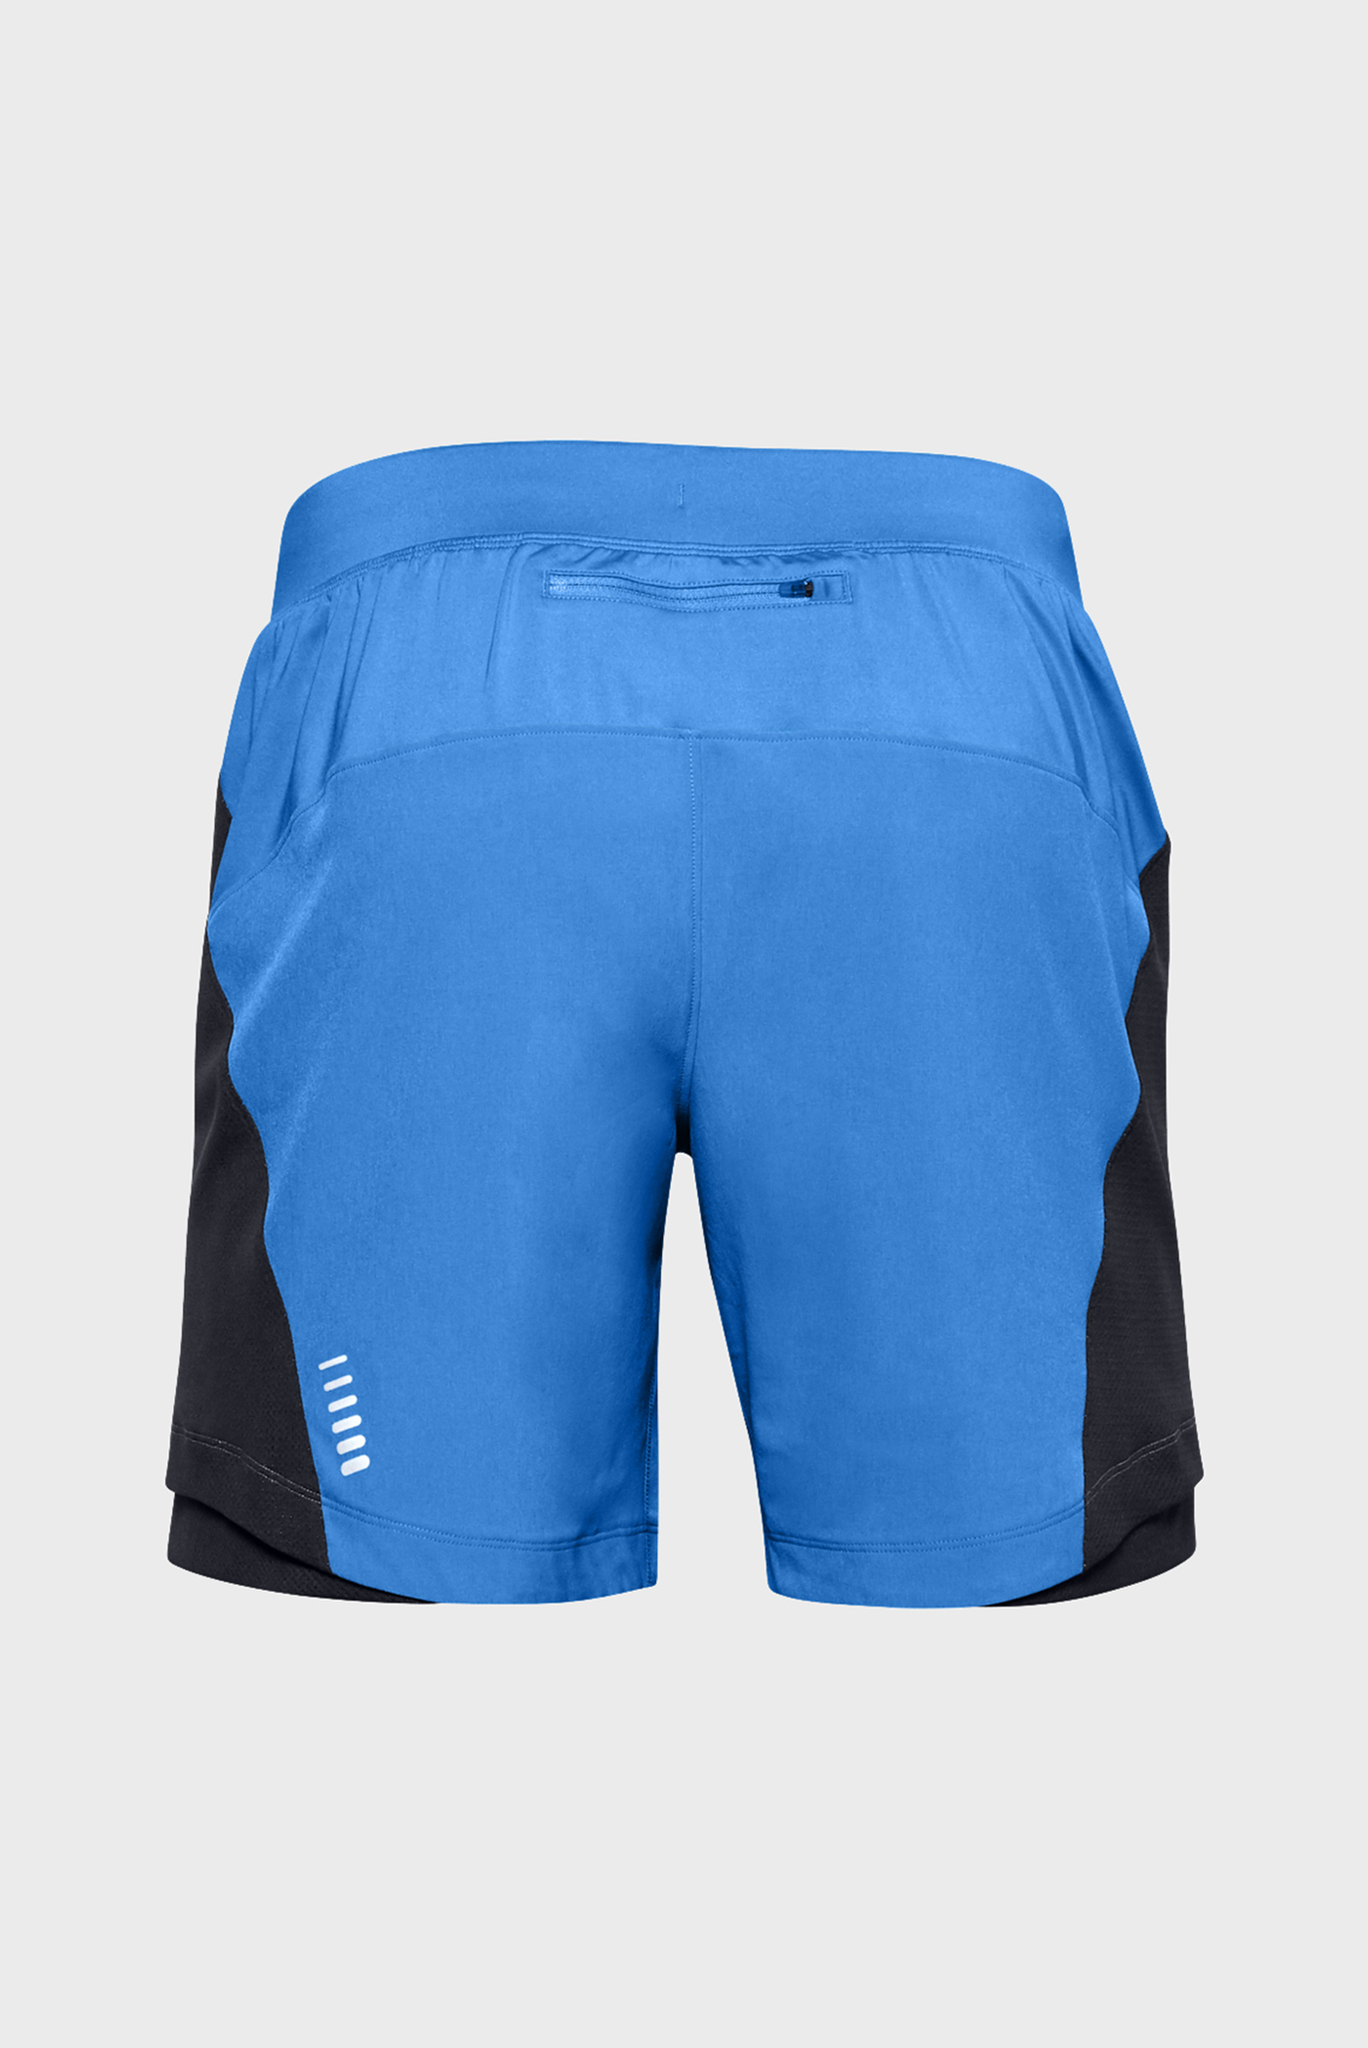 Мужские голубые шорты UA QUALIFIER SPEEDPOCKET 7'' Under Armour